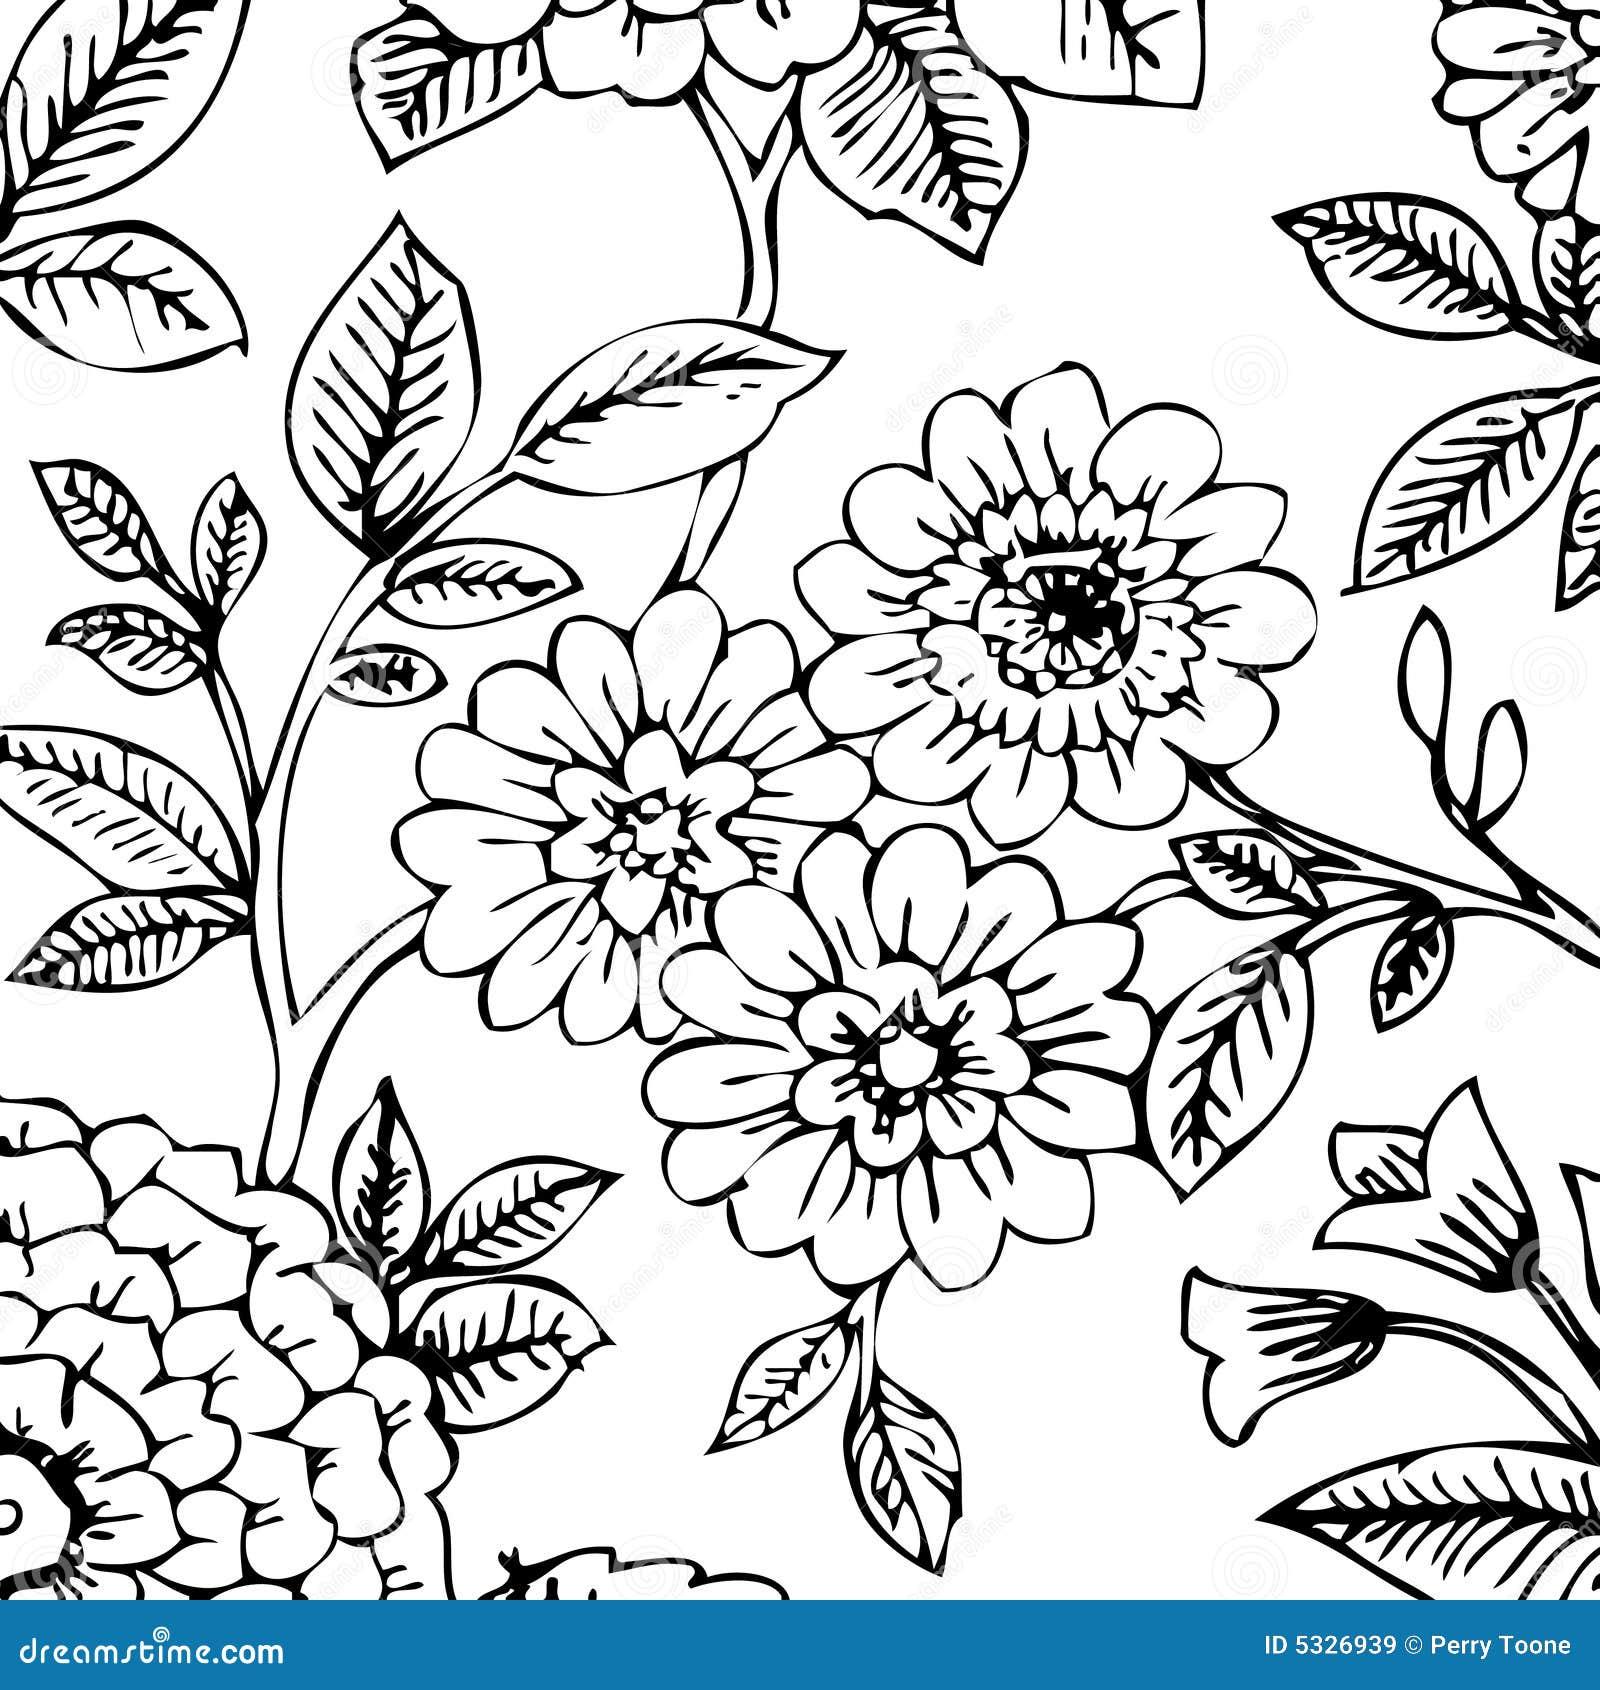 Carta Da Parati Floreale Bianco E Nero.Carta Da Parati Floreale Nera Bianca Illustrazione Vettoriale